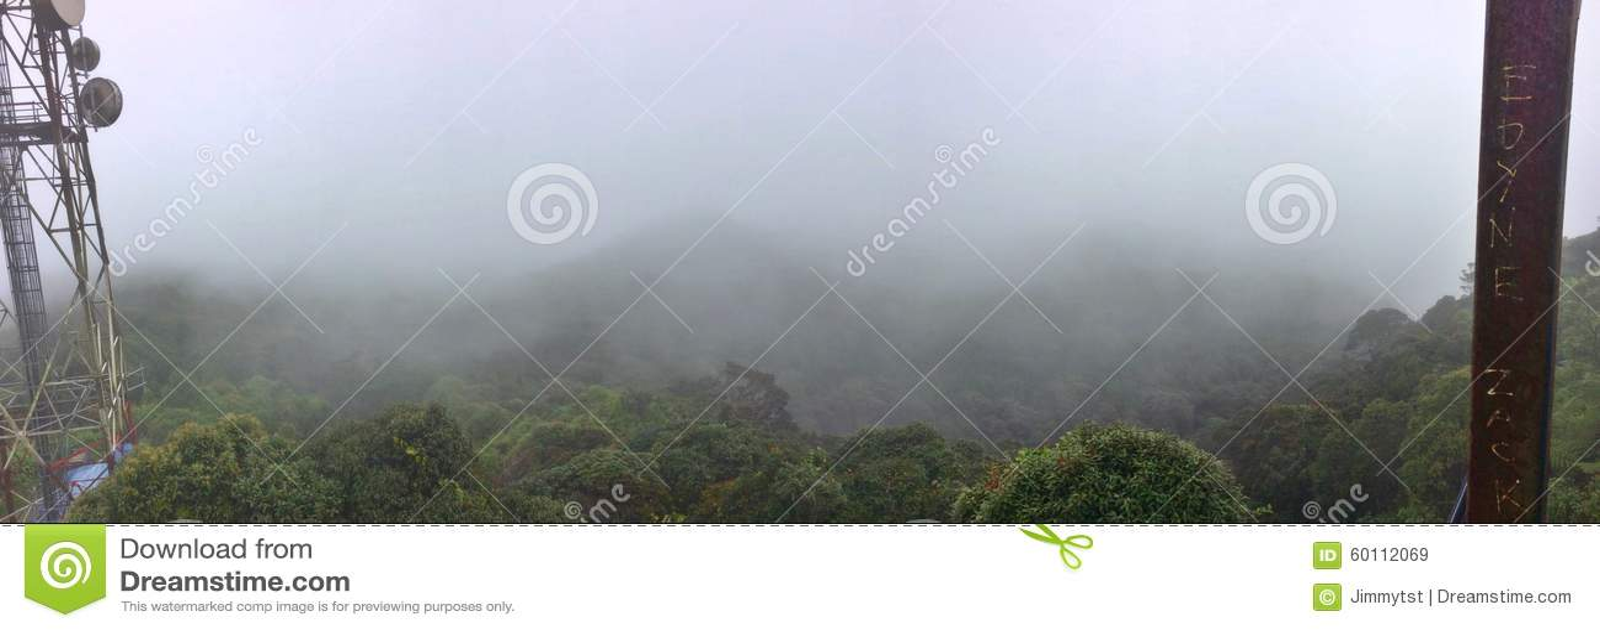 Toppmötesikt - Gunung Brinchang